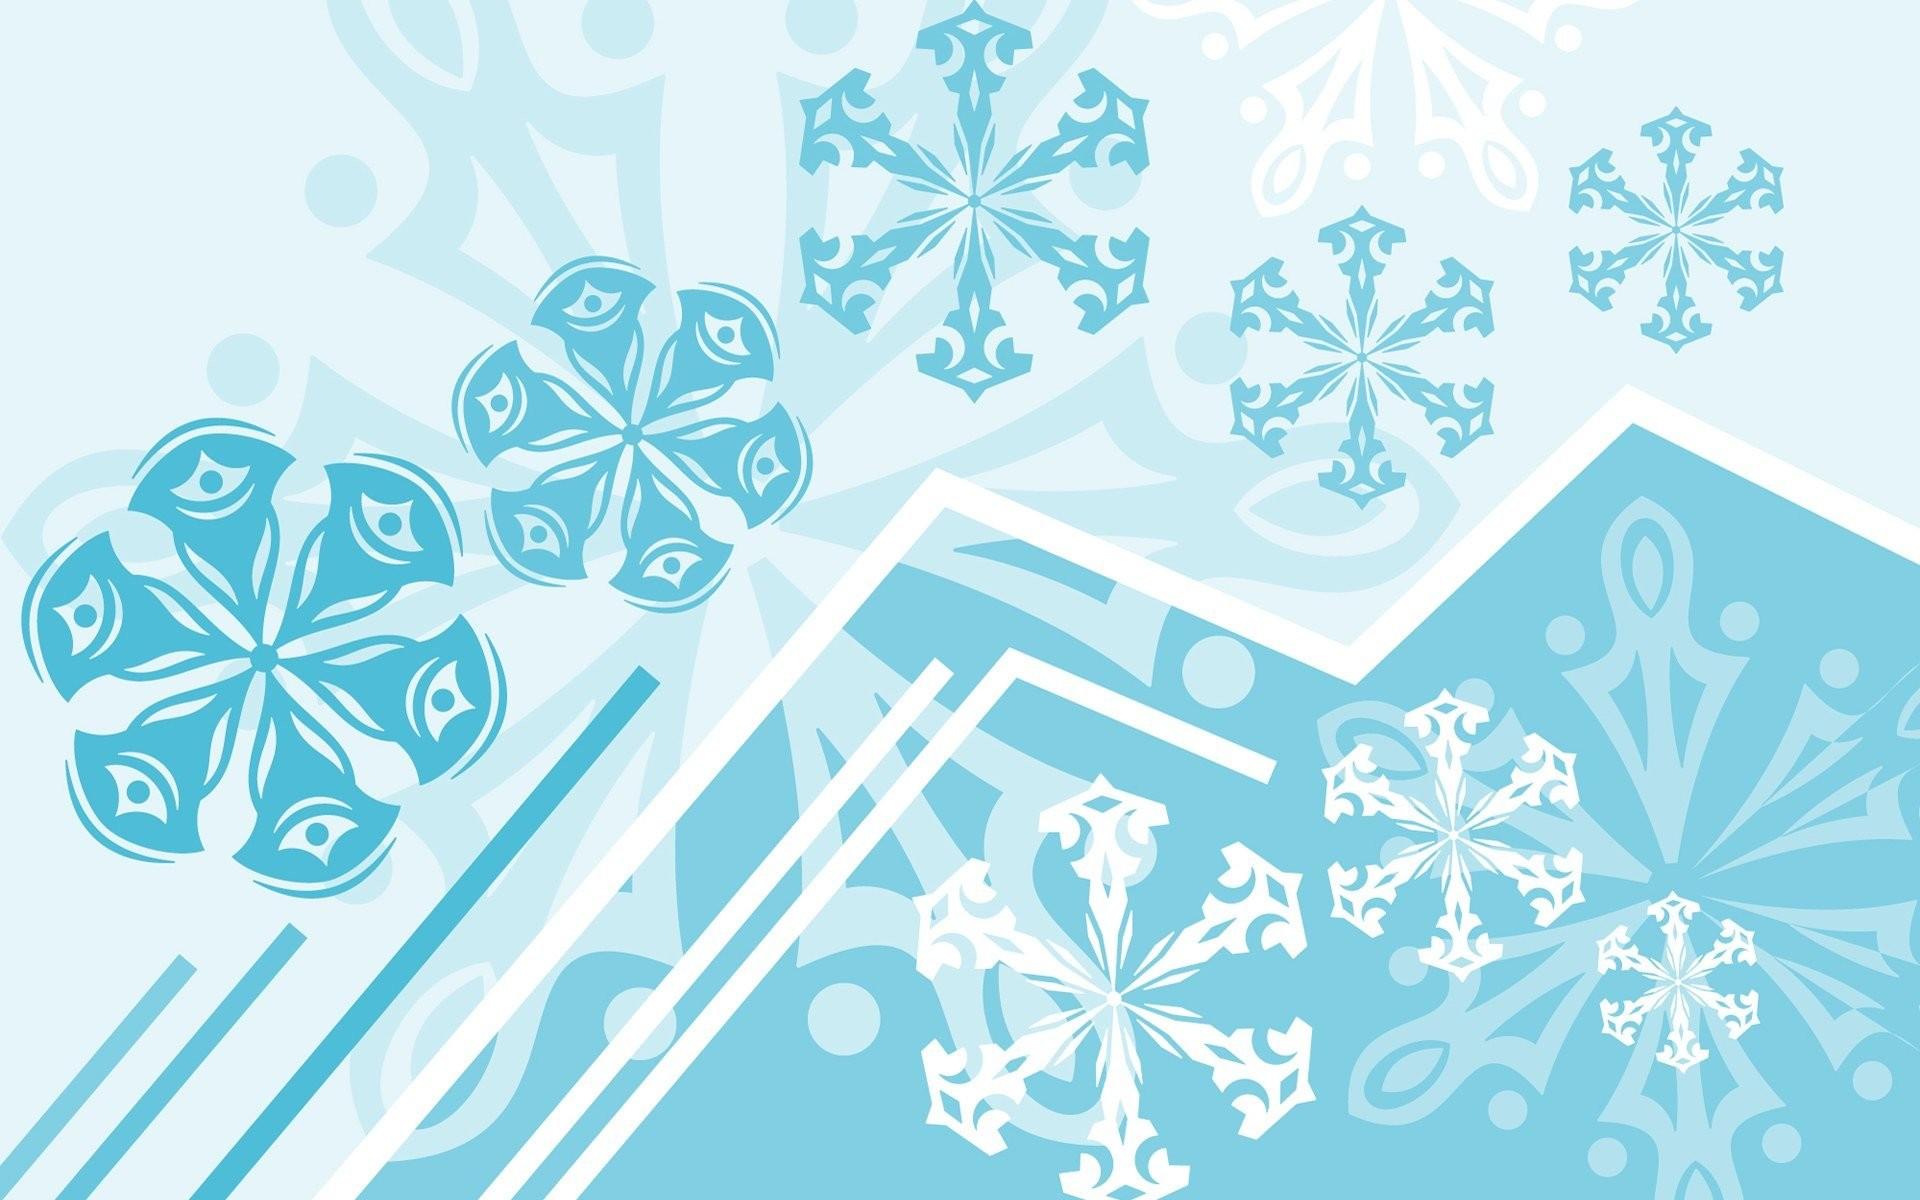 Cartoon Winter Background Wallpaper 529523